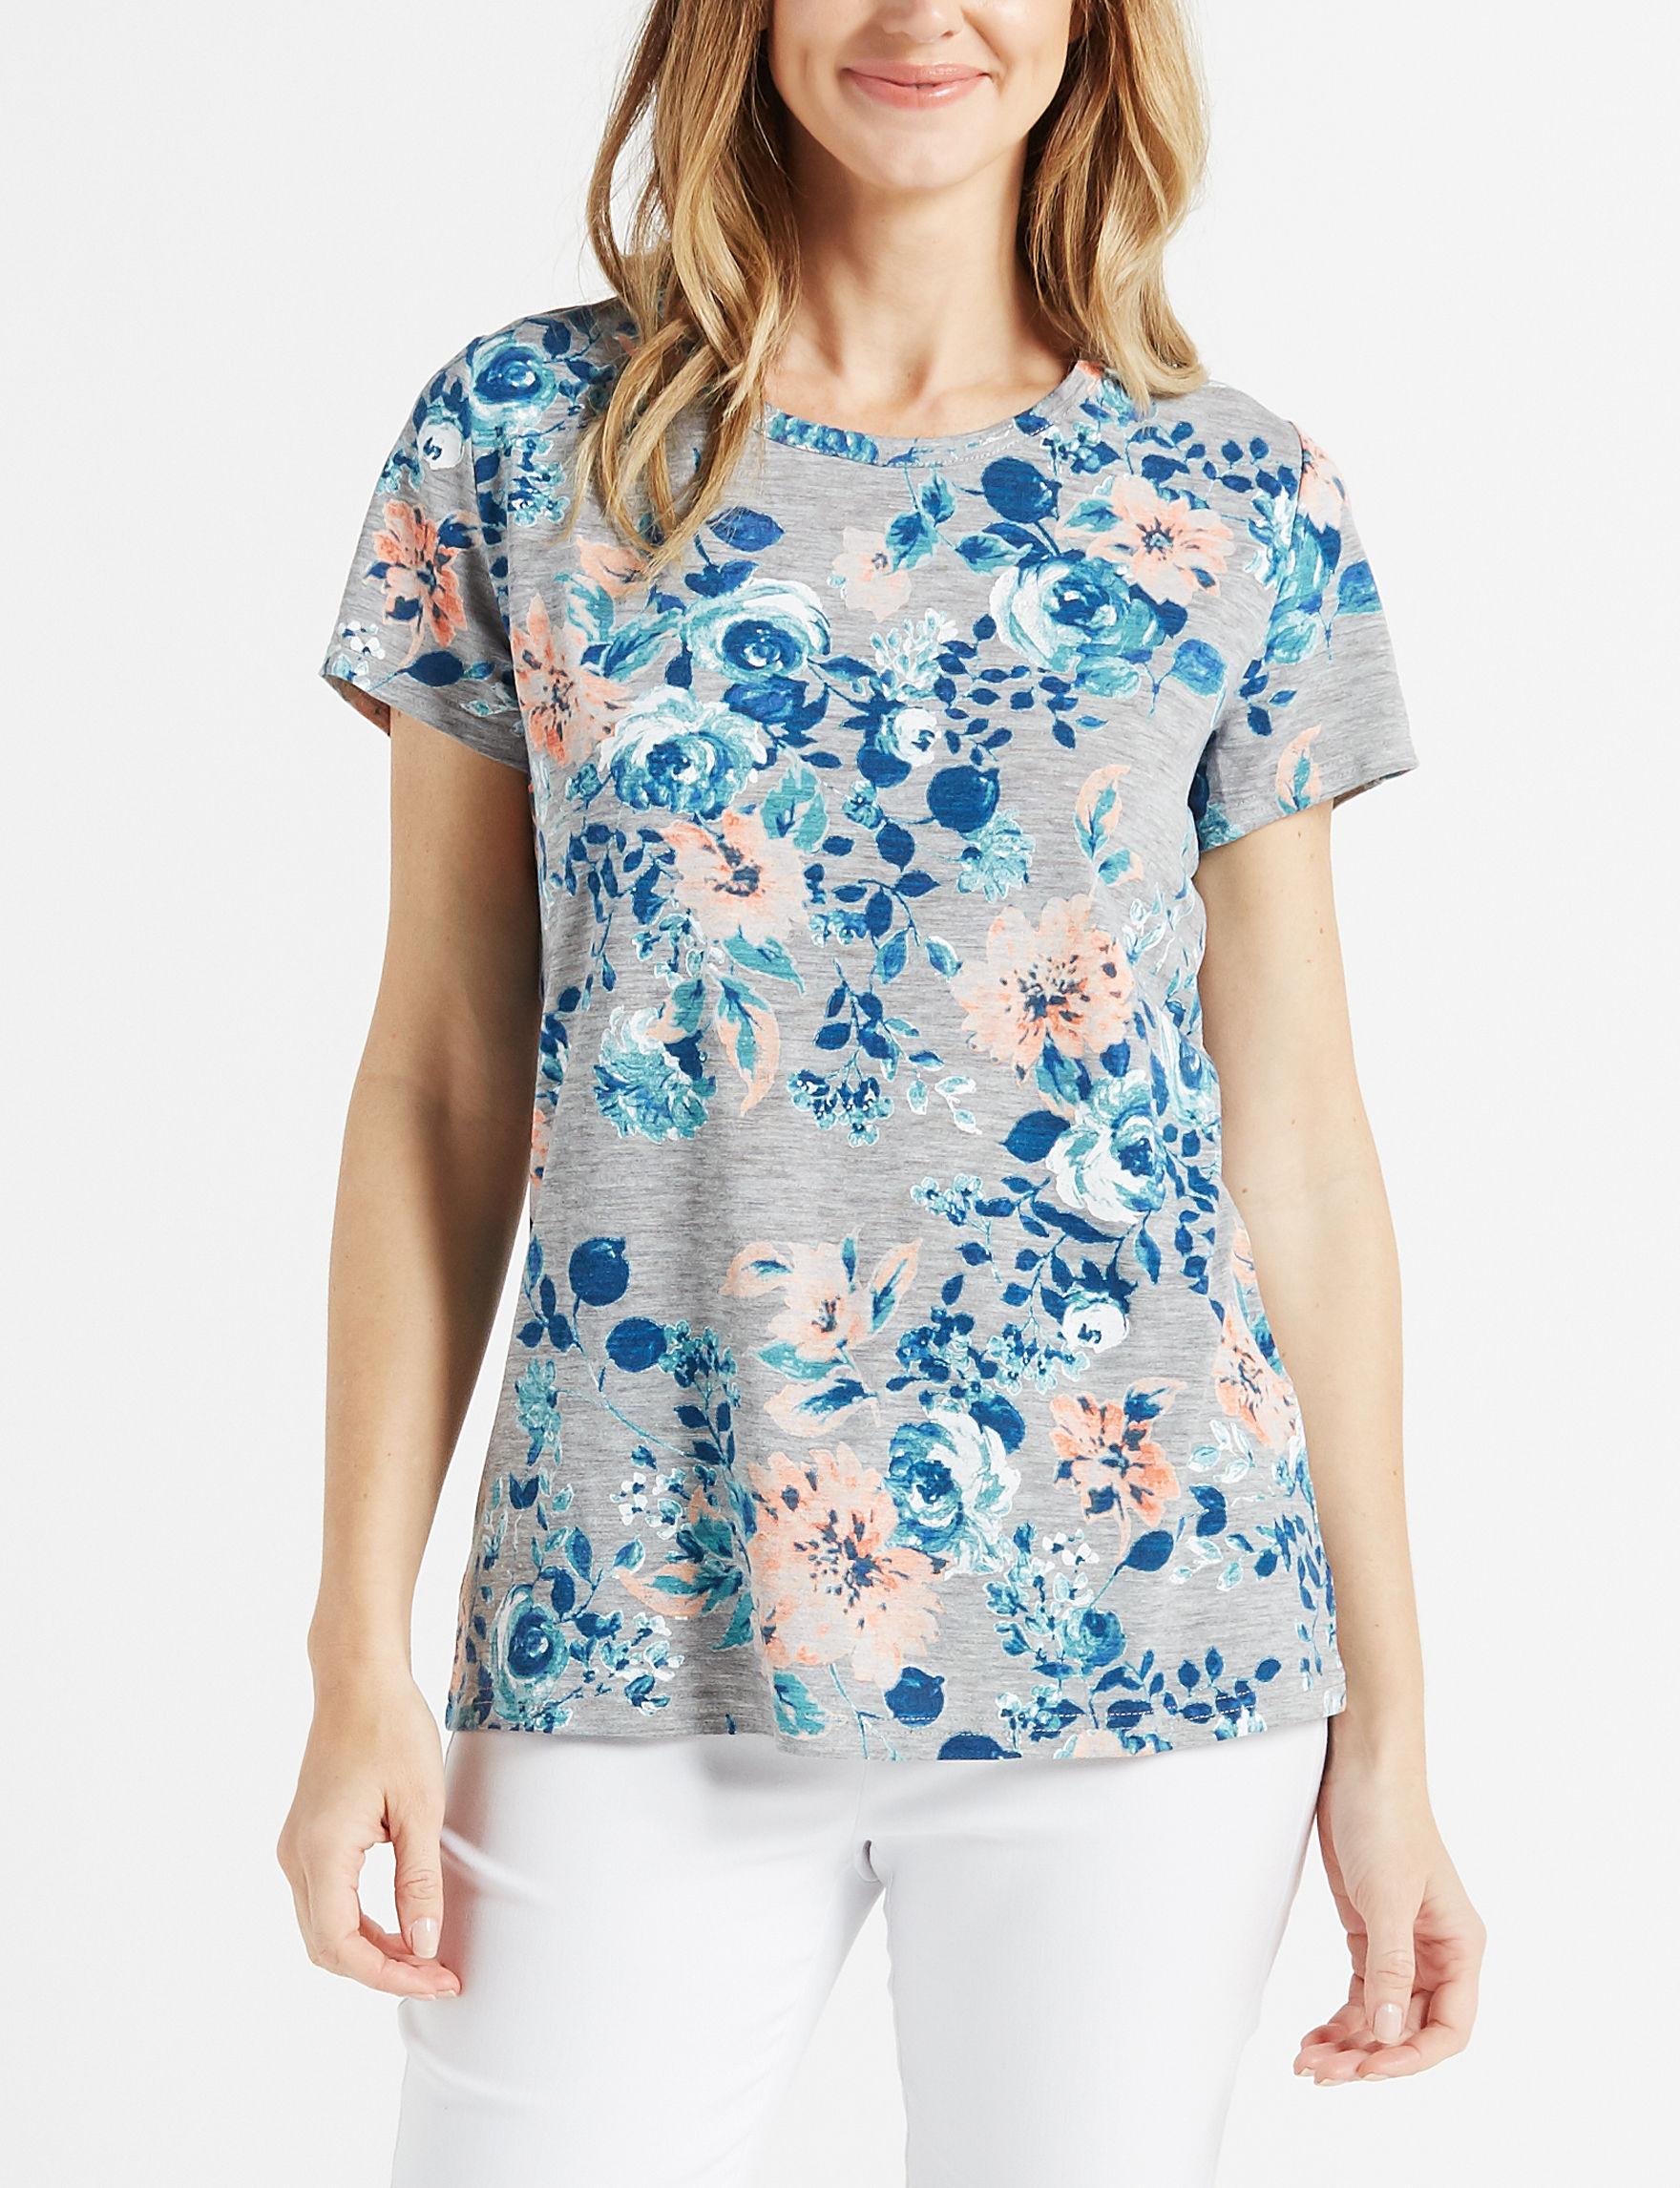 Onyx Grey / Pink Floral Shirts & Blouses Tees & Tanks